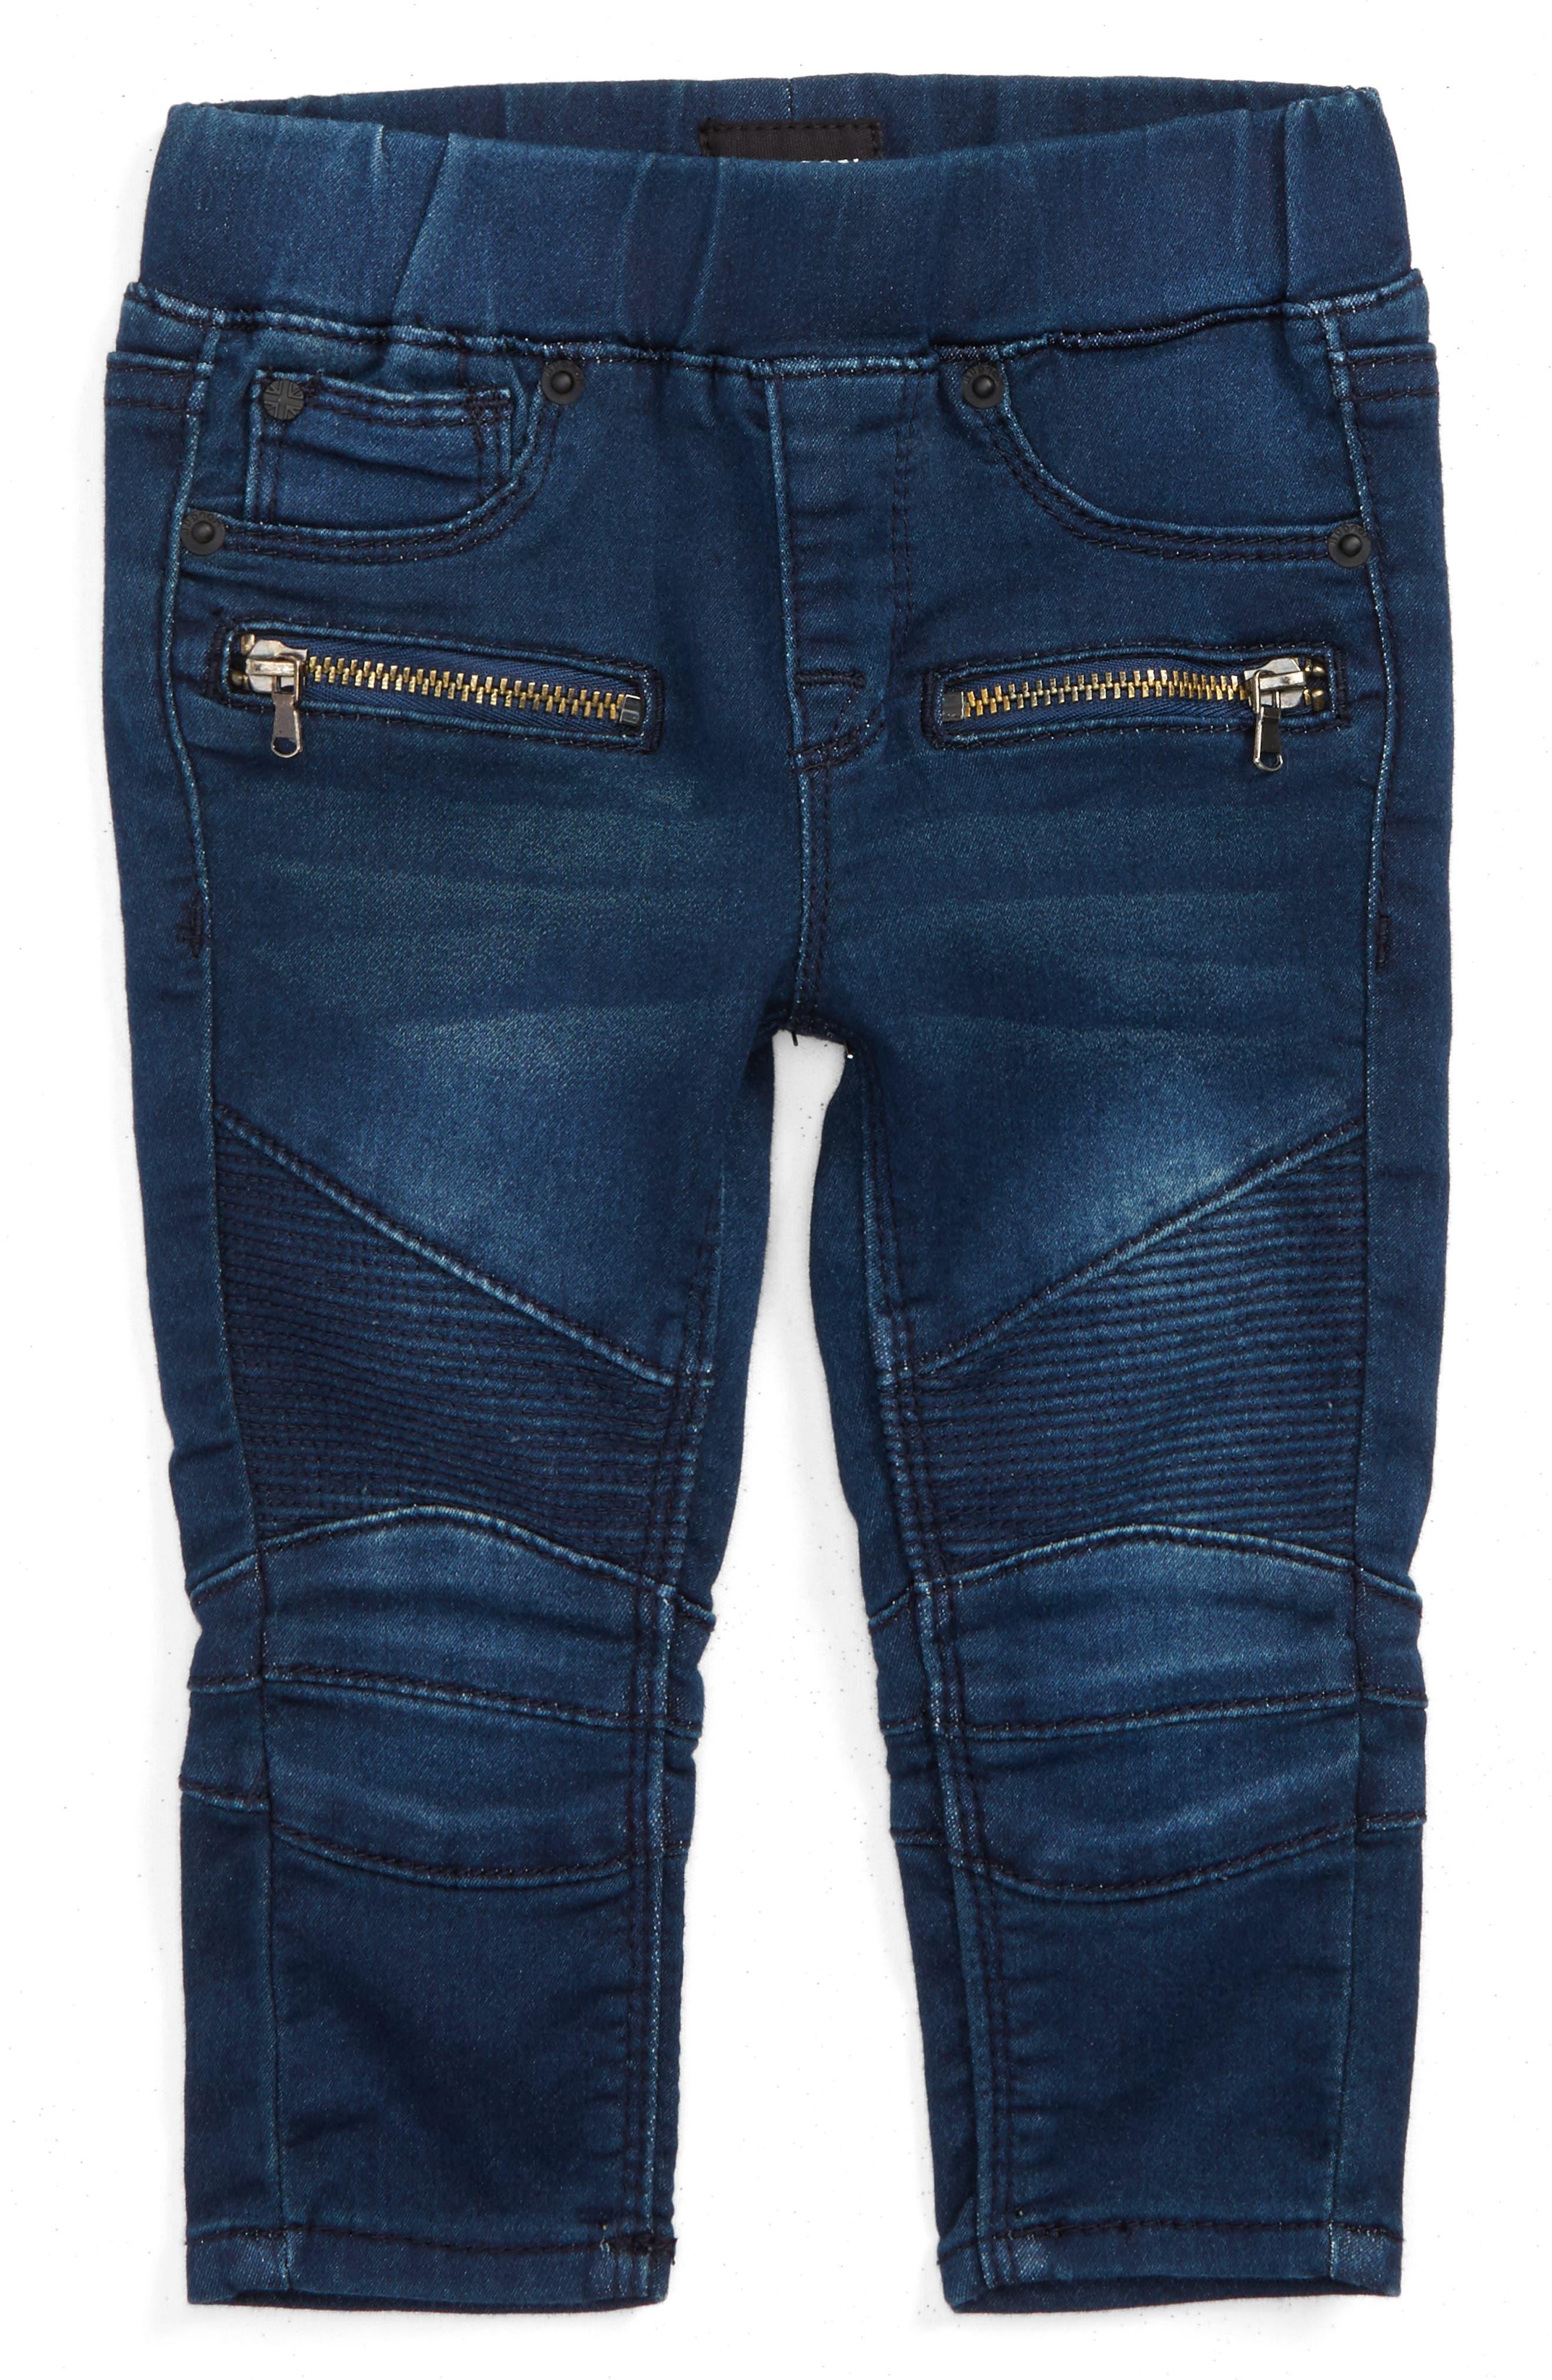 Moto Skinny Jeans,                             Main thumbnail 1, color,                             476